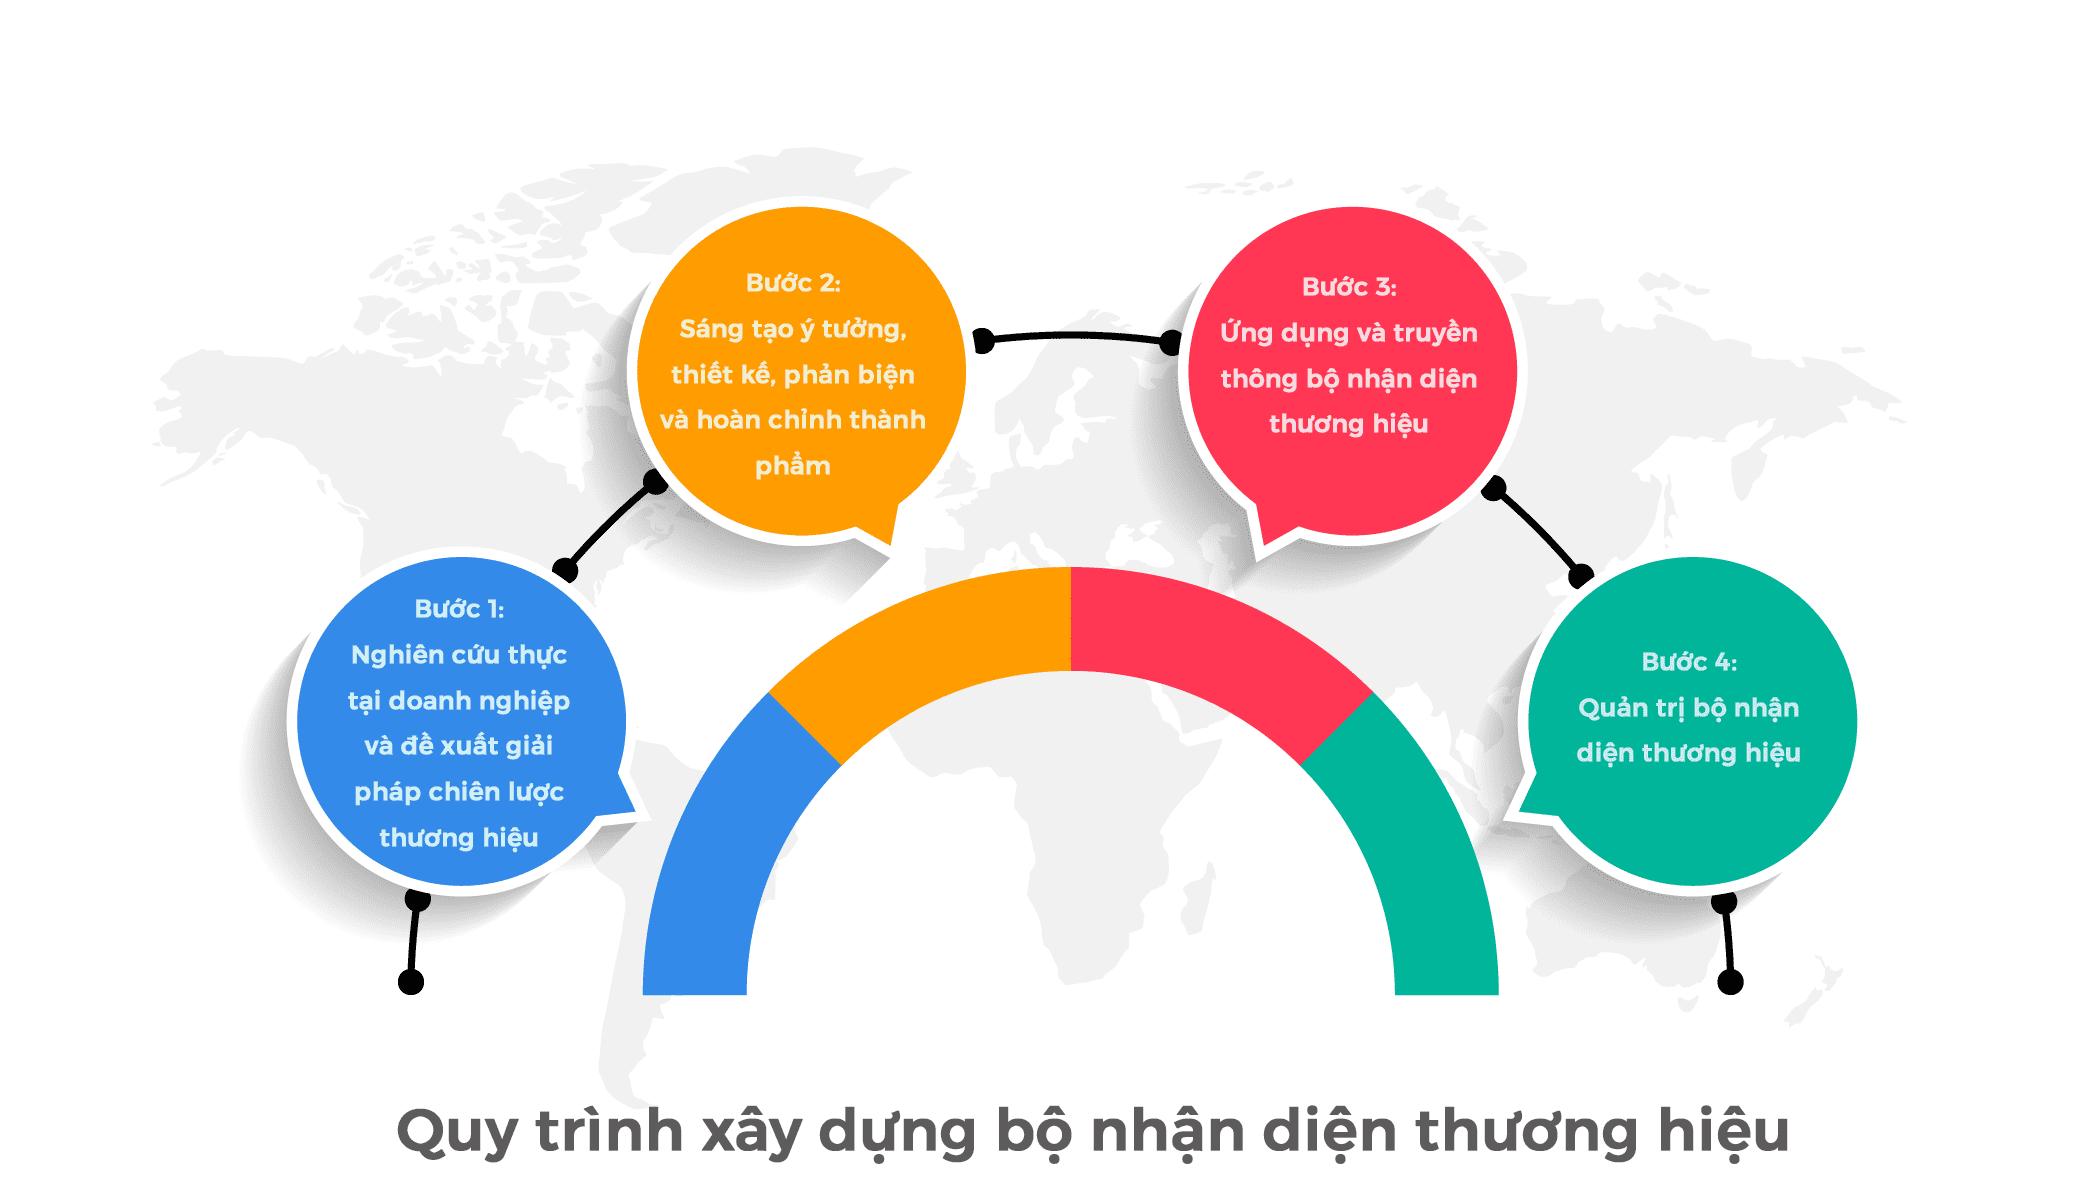 xay-dung-bo-nhan-dien-thuong-hieu-2